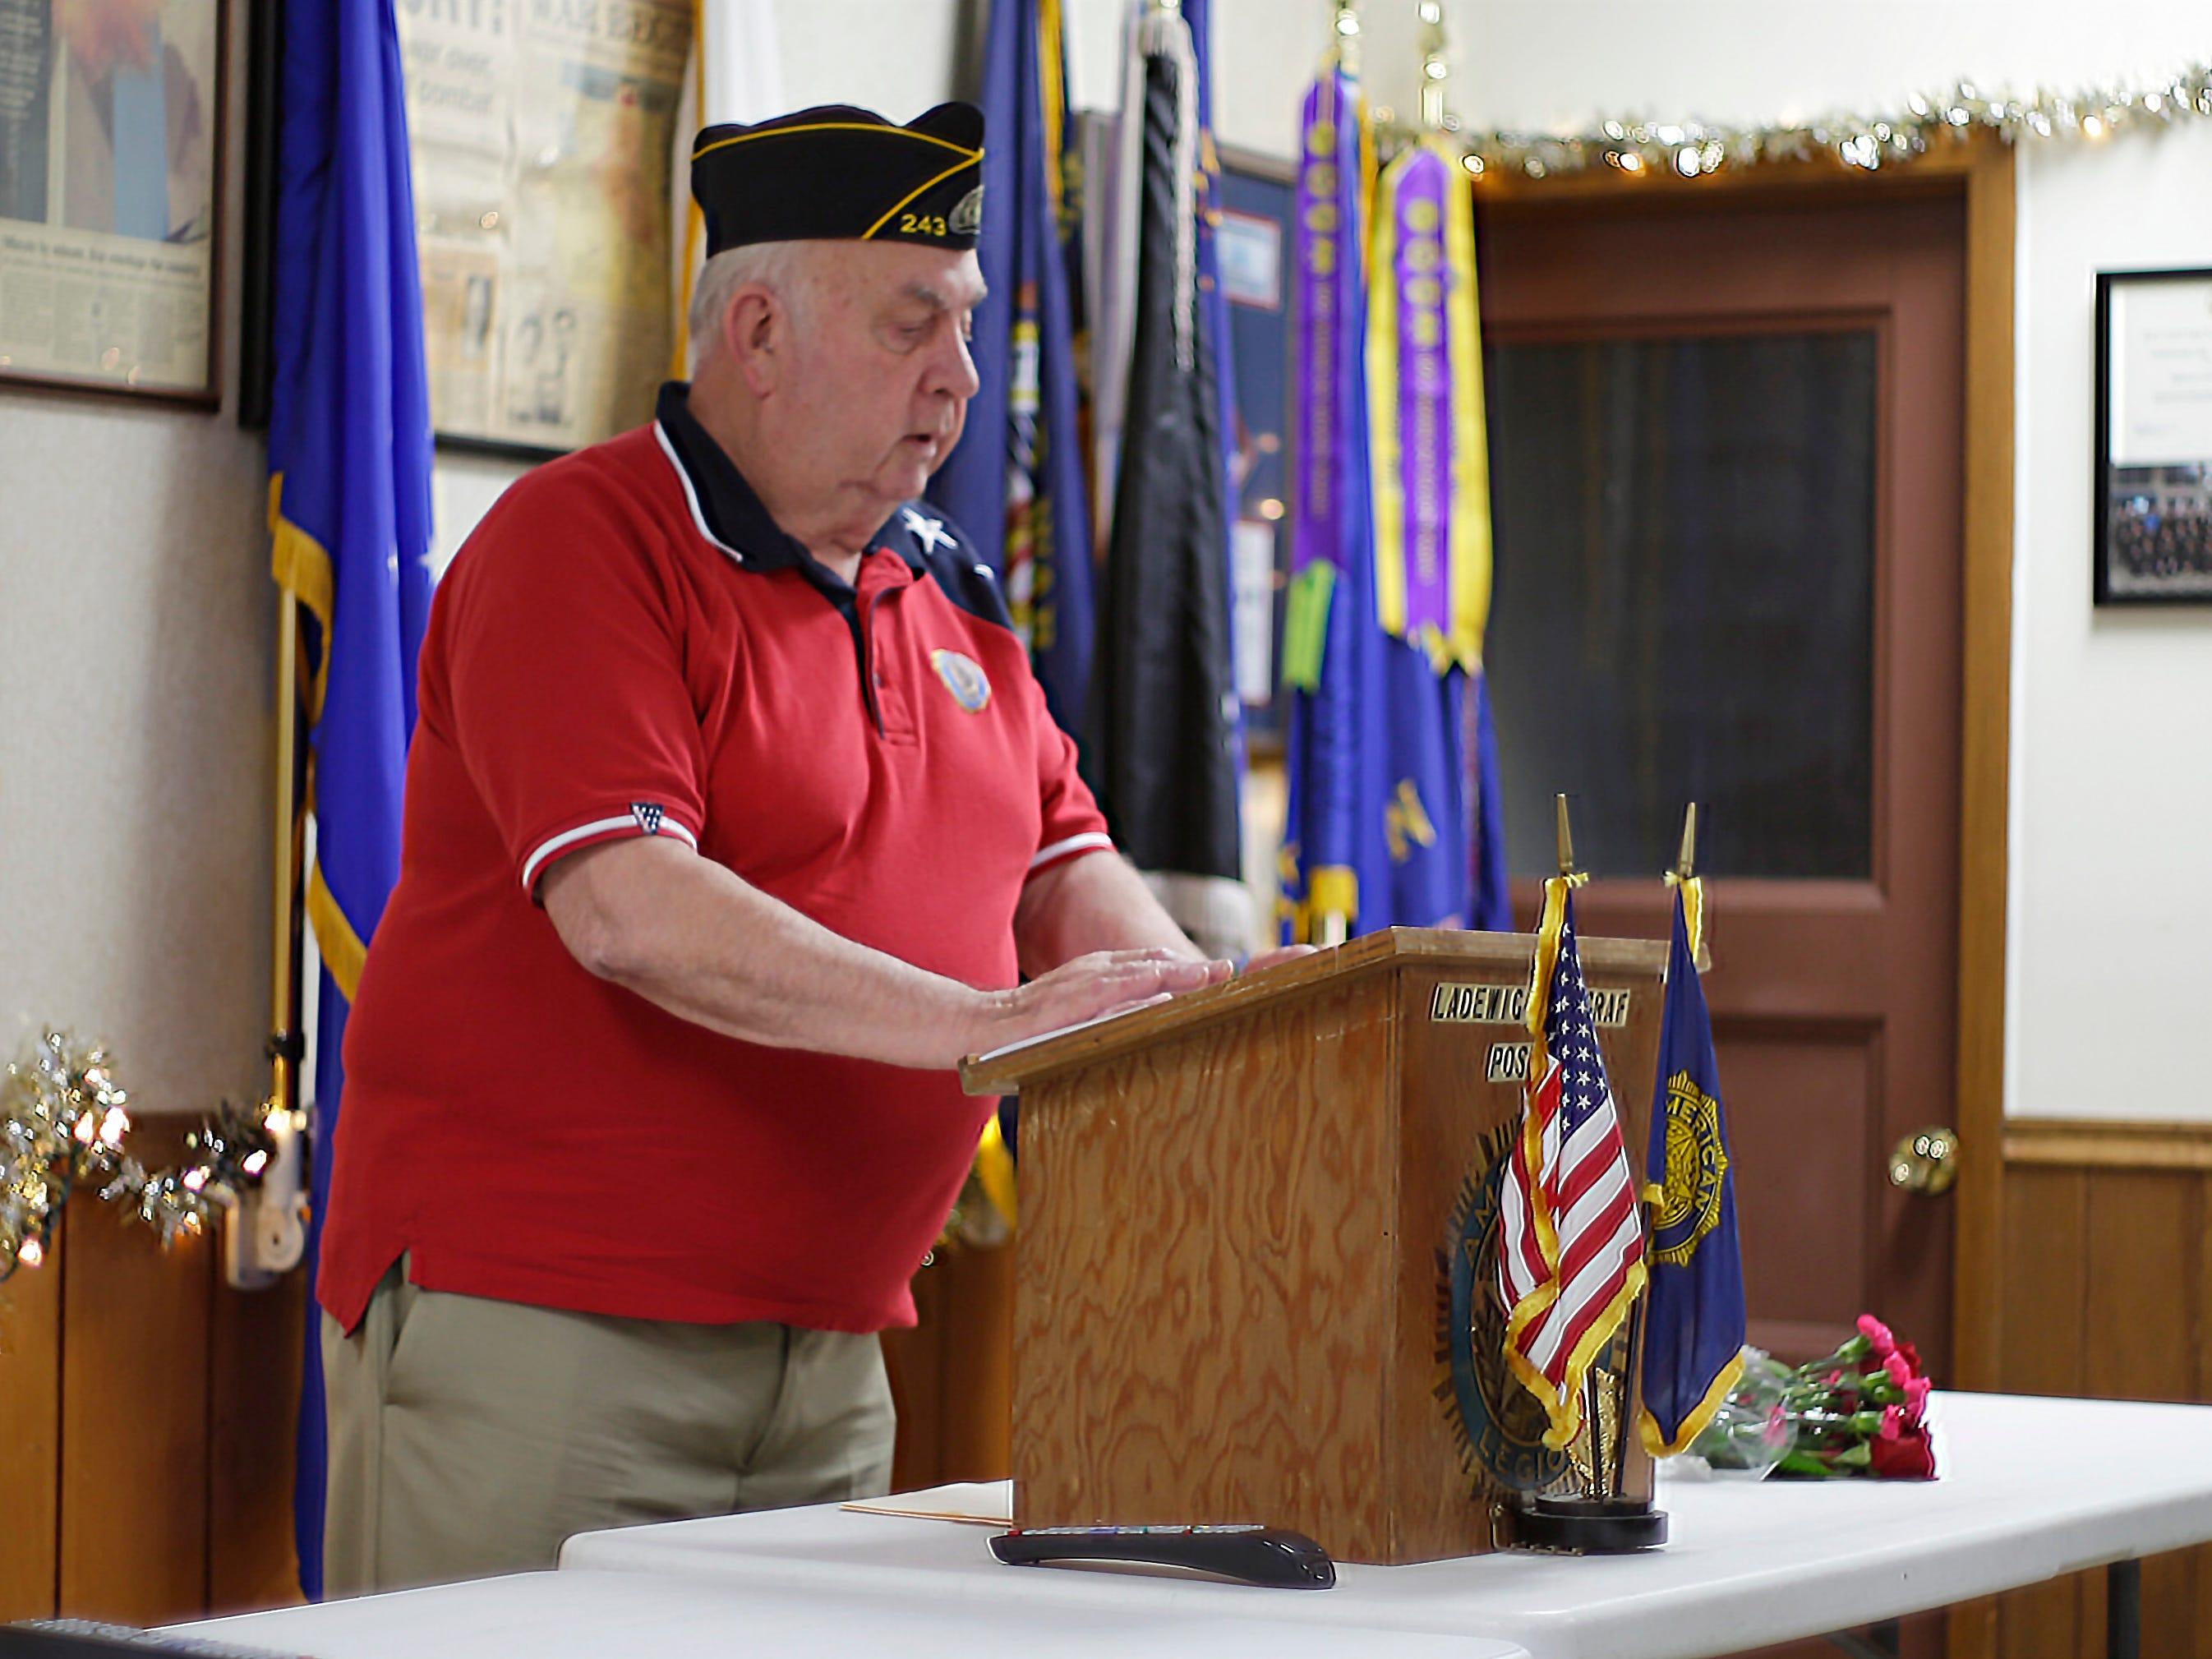 American Legion Ladwig-Zinkgraf Post 243 Adjutant Konrad Kaczkowski speaks during the Pearl Harbor Ceremony at the Post, Friday, December 7, 2018, in Plymouth, Wis.